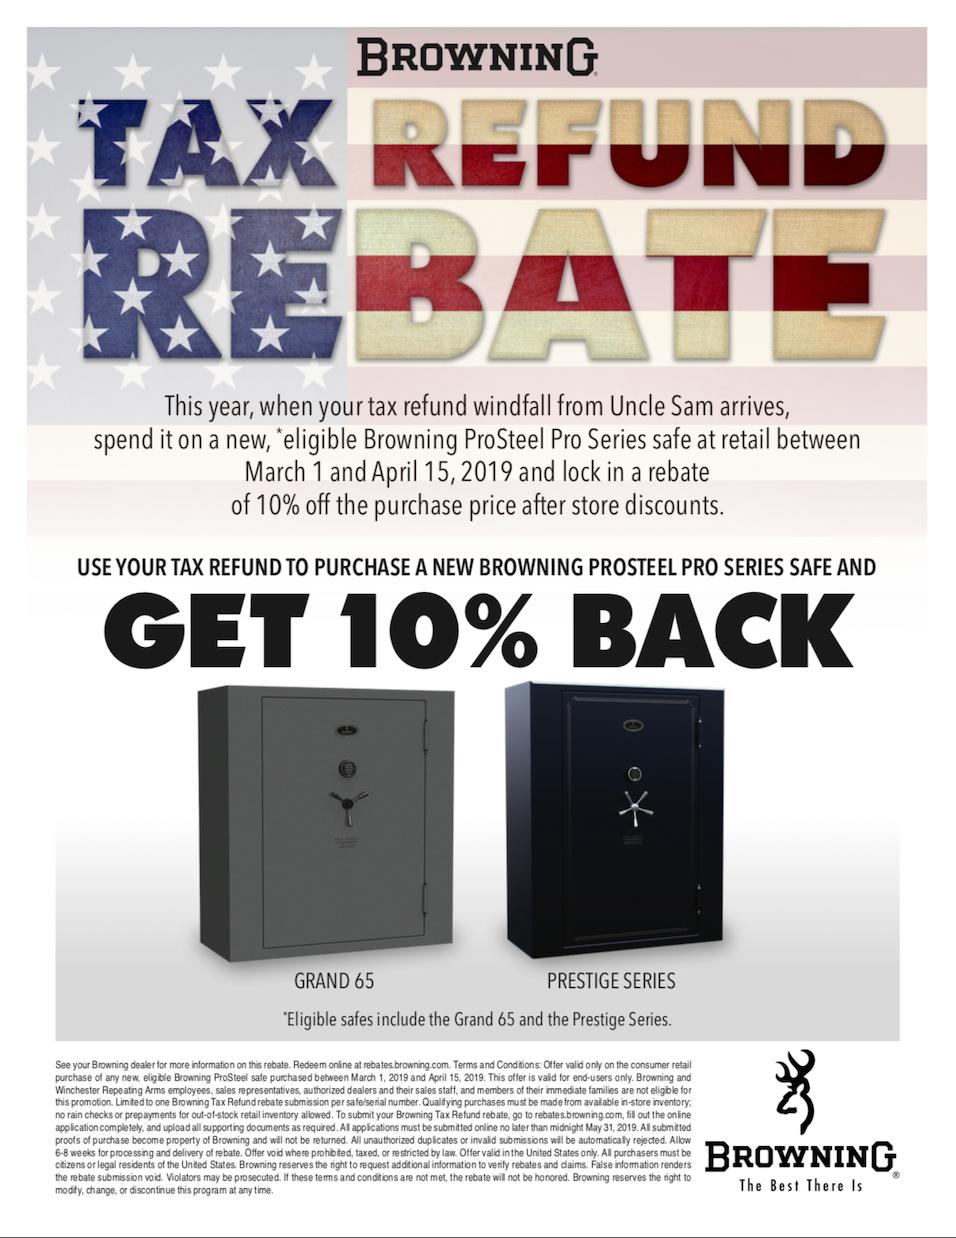 Browning Safe Tax Refund Rebate - The Safe House Nashville, TN